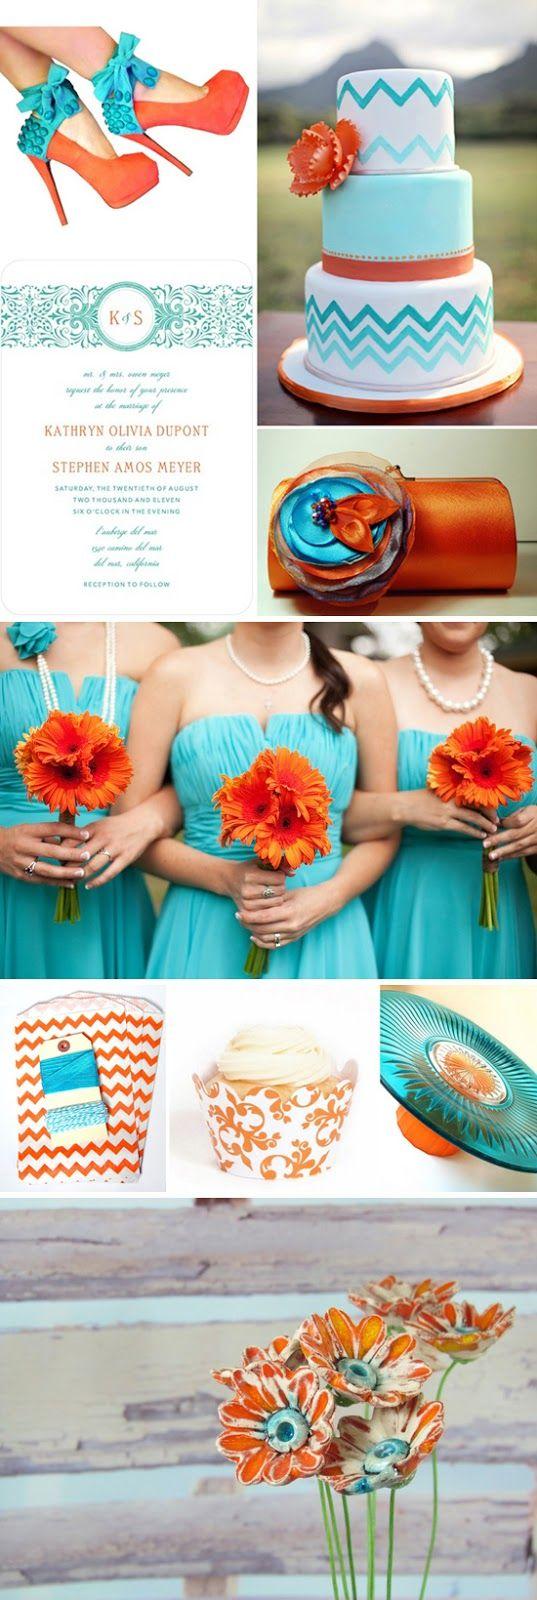 {Inspiration Boards} Turquoise & Orange ~ Savvy Deets Bridal - A Wedding Blog